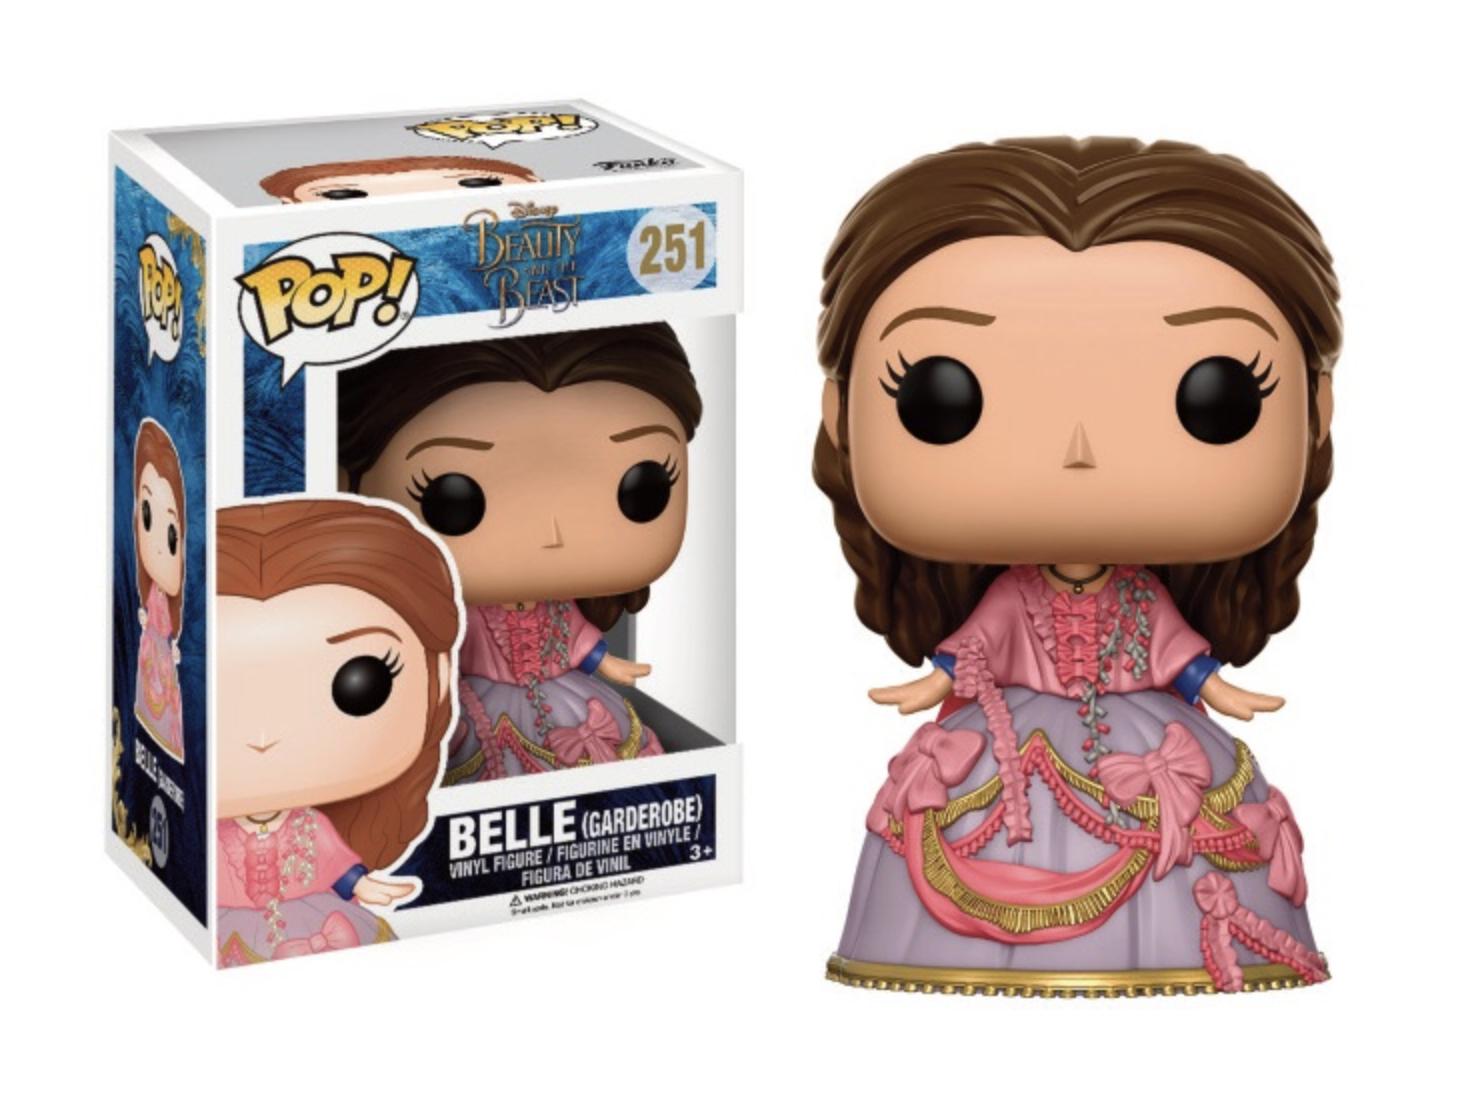 Pop! Disney Beauty and the Beast: Belle with Garderobe Outfit Edição Limitada